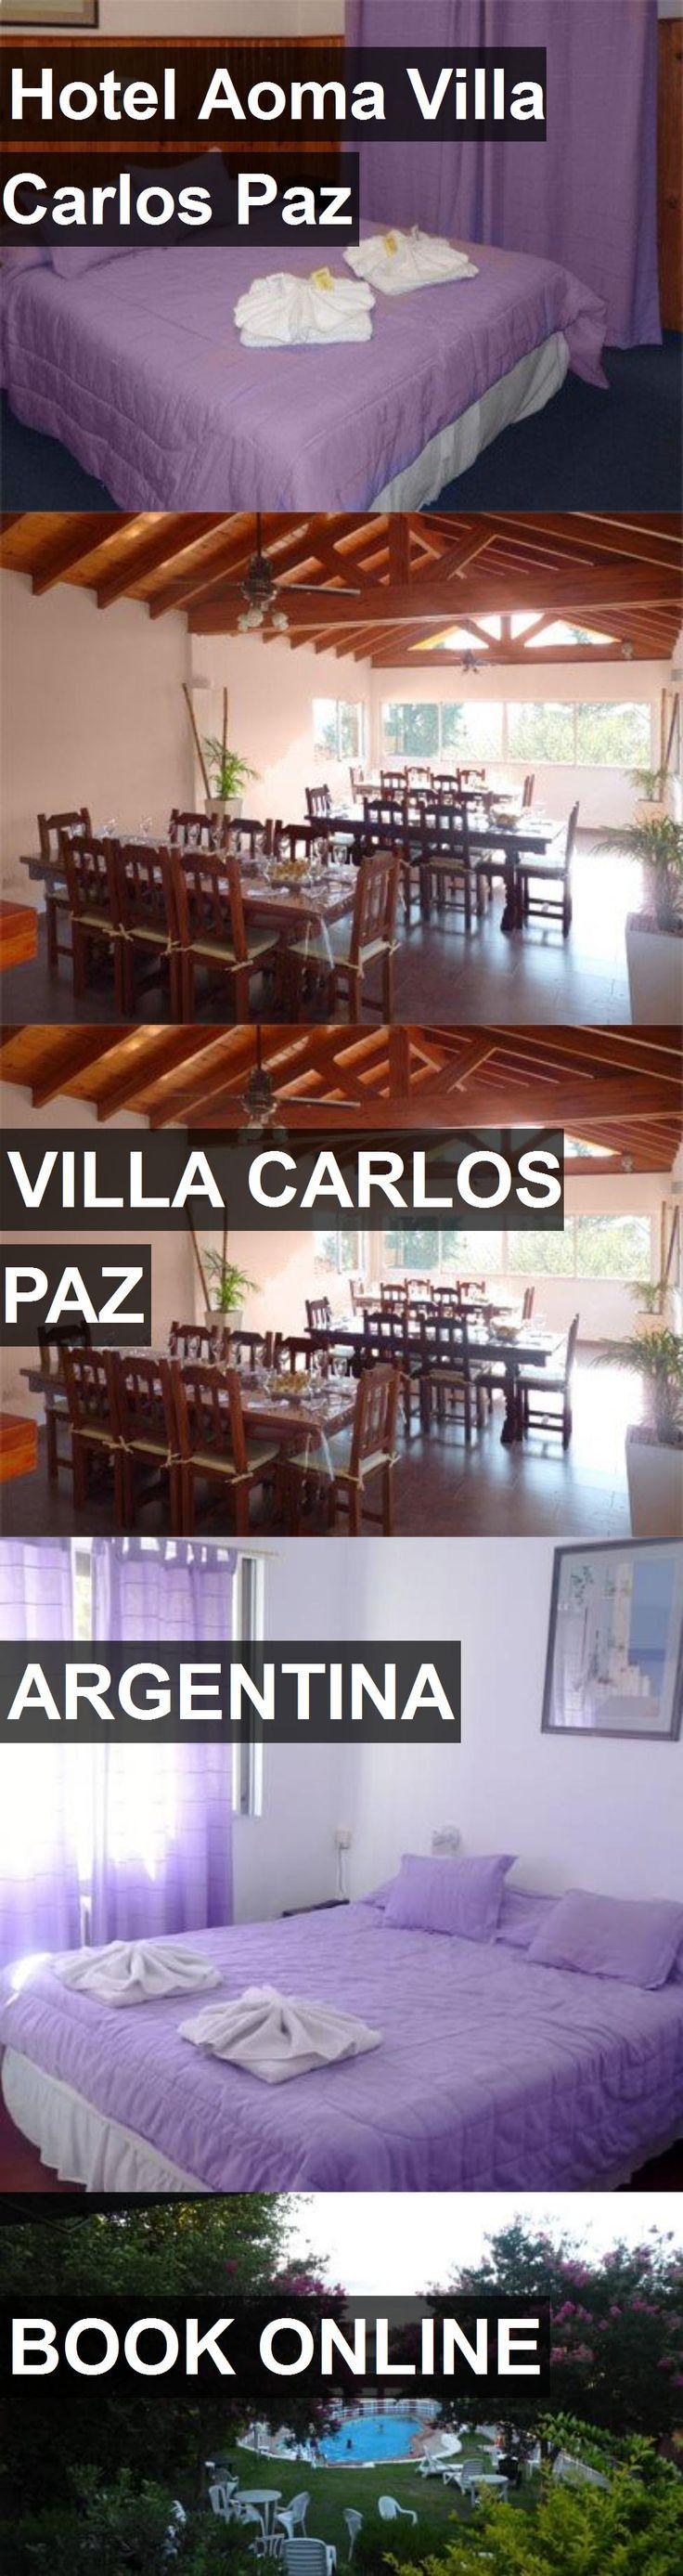 Hotel Aoma Villa Carlos Paz in Villa Carlos Paz, Argentina. For more information, photos, reviews and best prices please follow the link. #Argentina #VillaCarlosPaz #travel #vacation #hotel